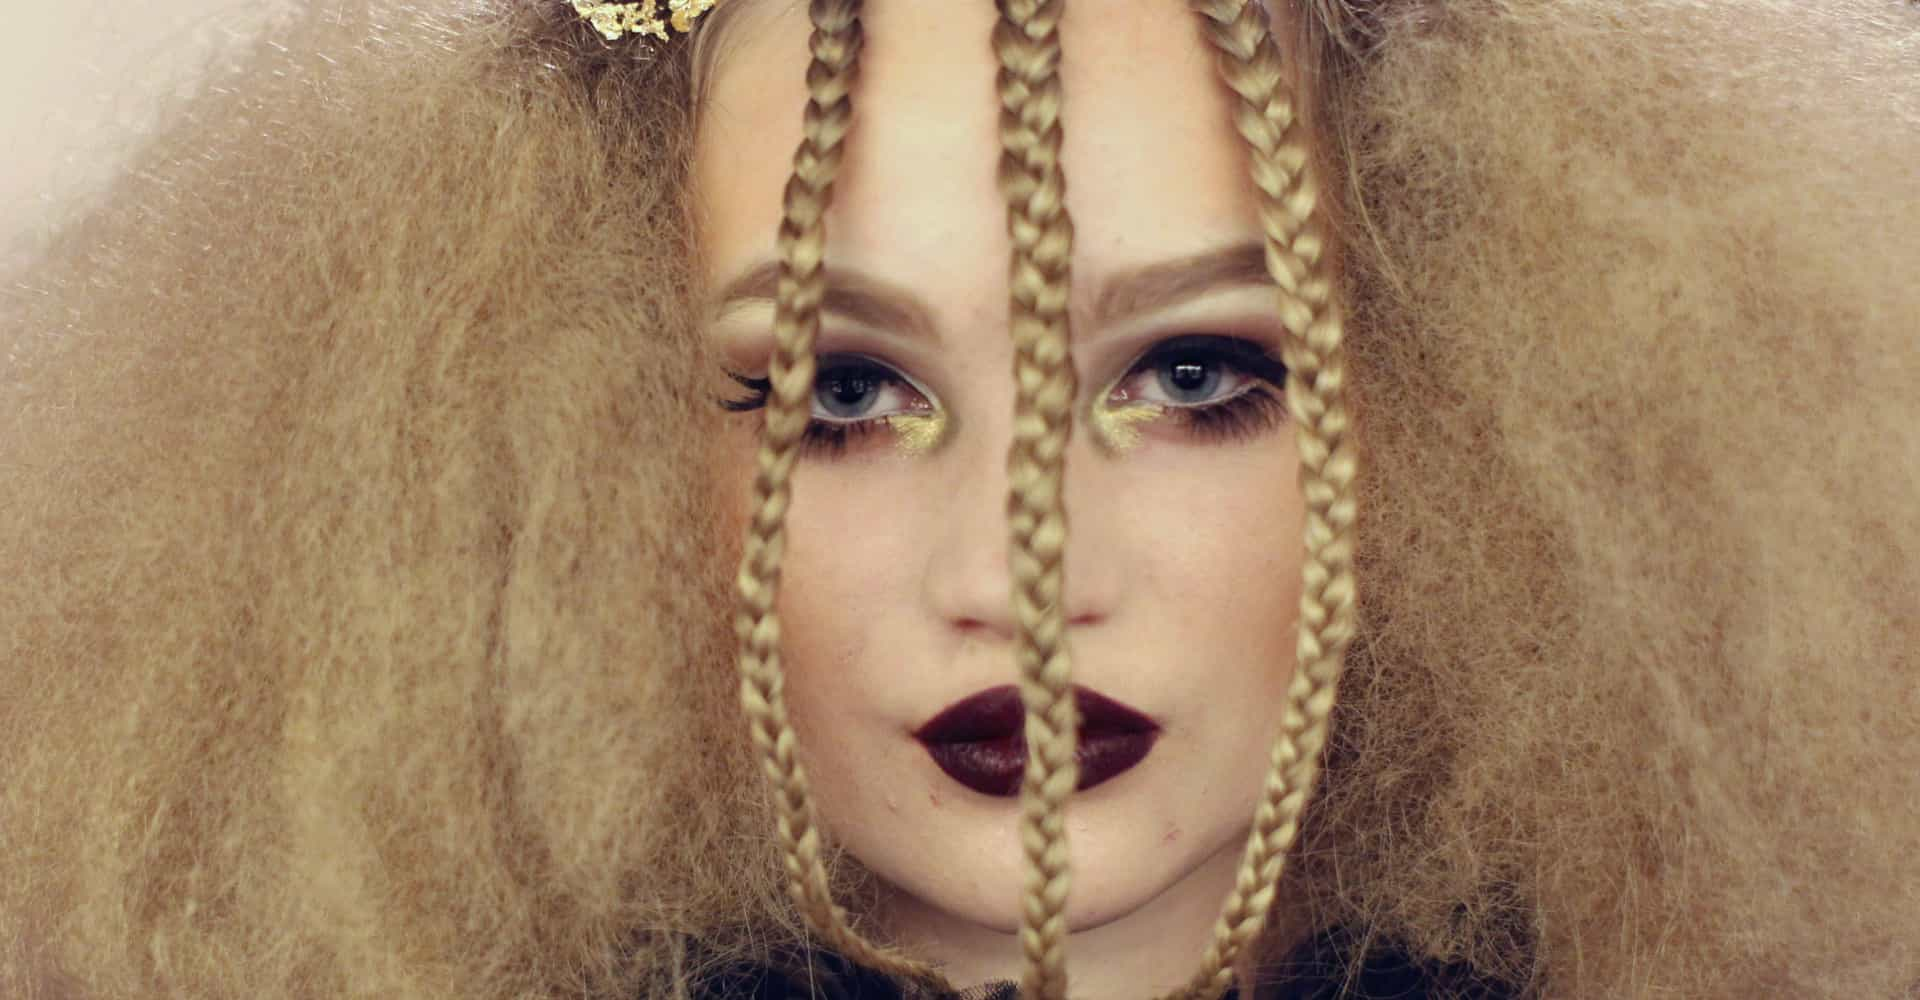 Des coiffures folles à adopter